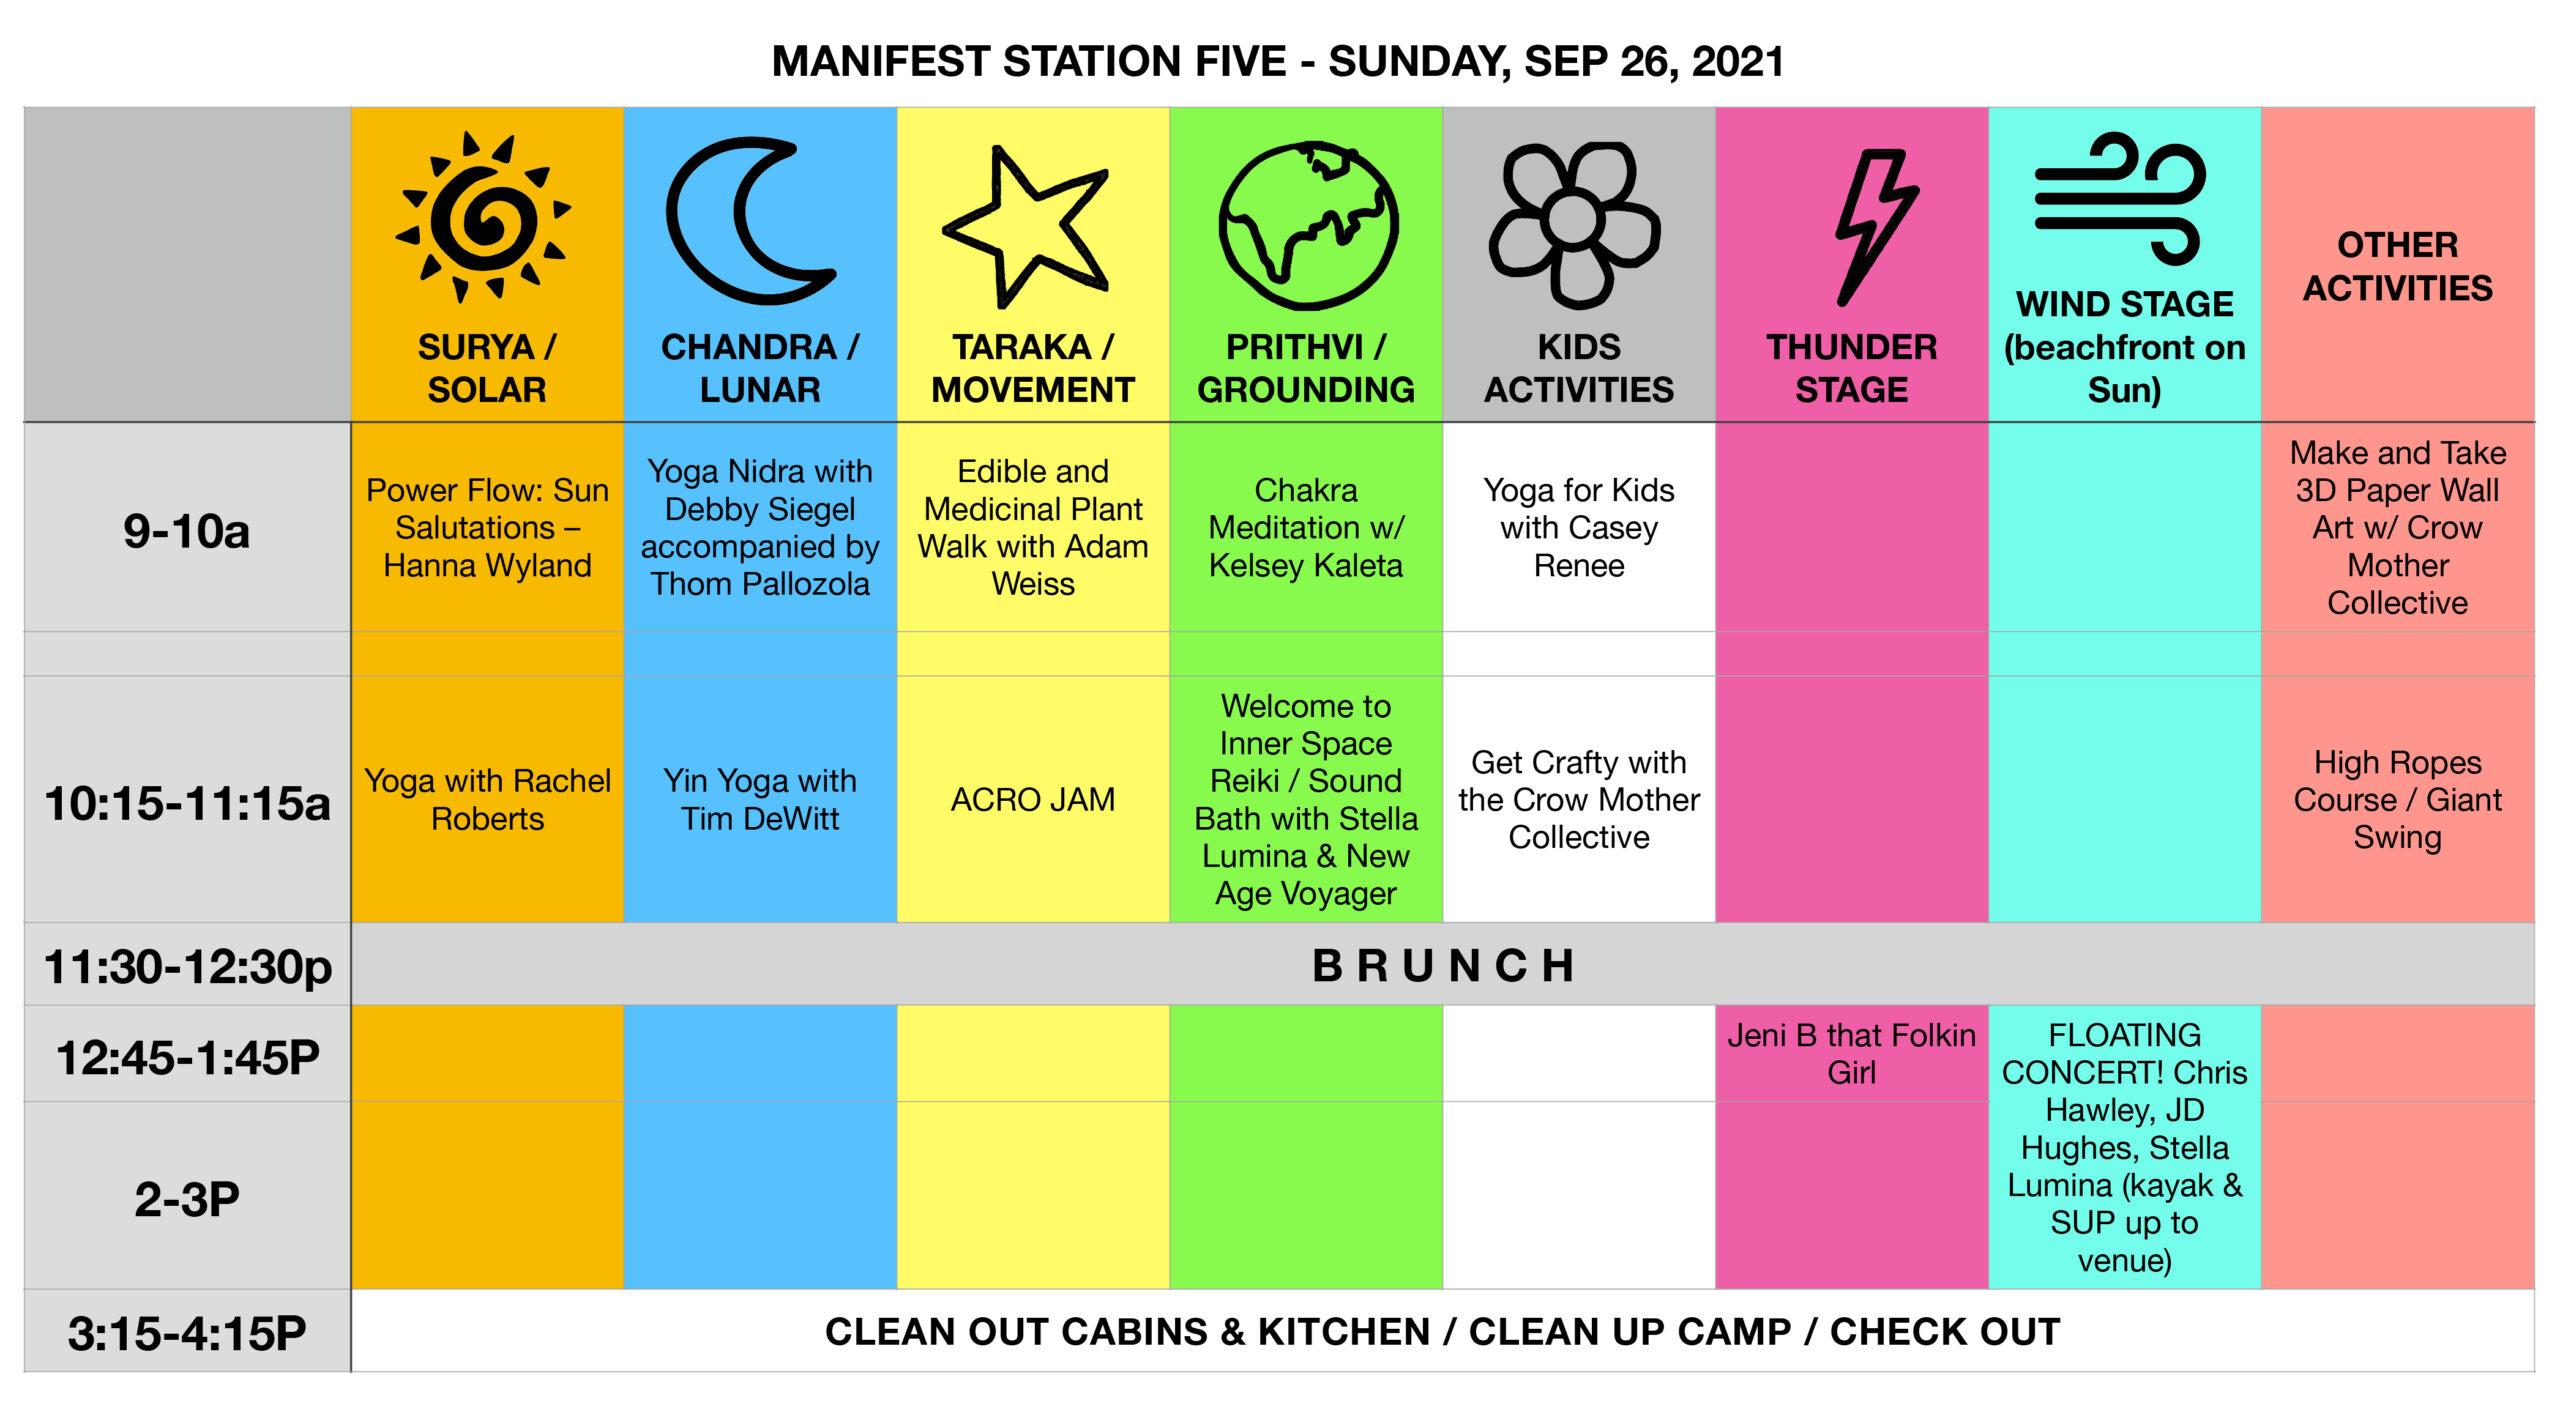 Manifest Station Music & Yoga Festival Schedule Sun Sep 26